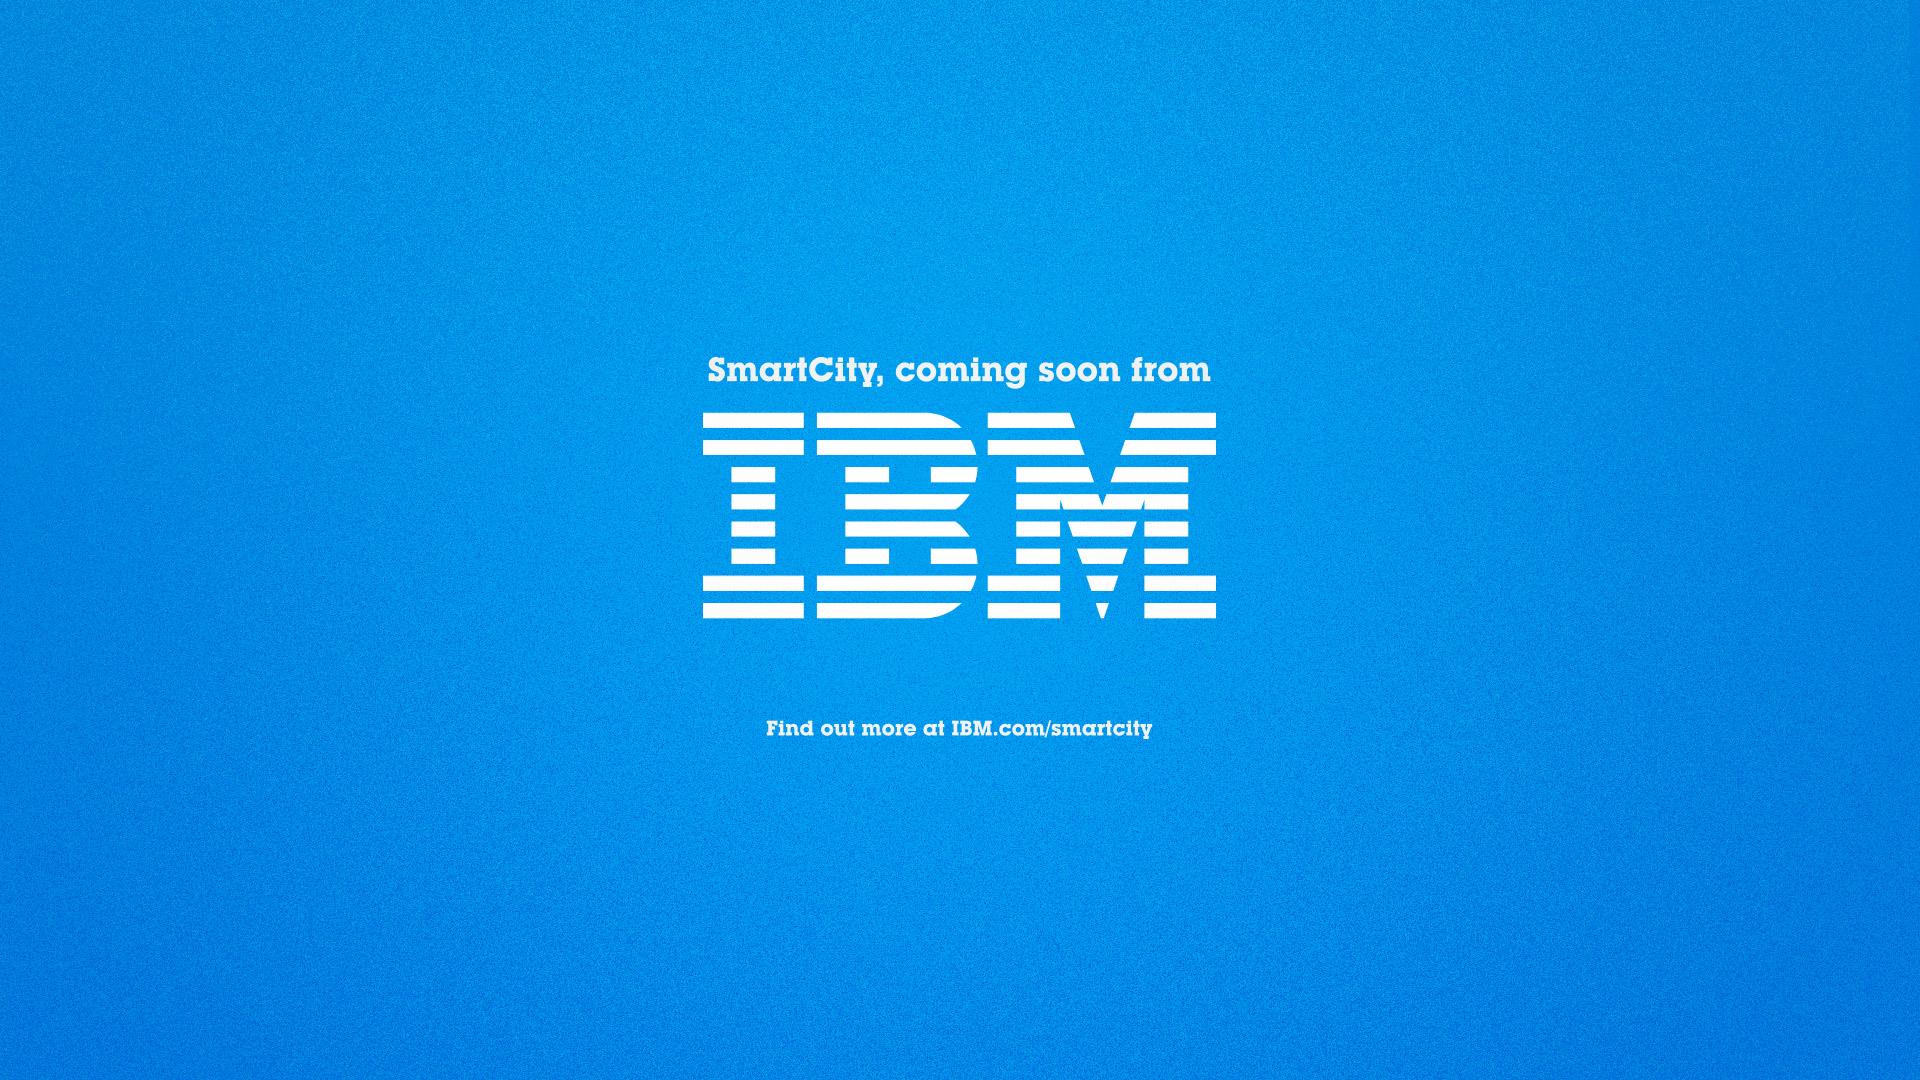 FRAME-21-IBM-JerryNelson